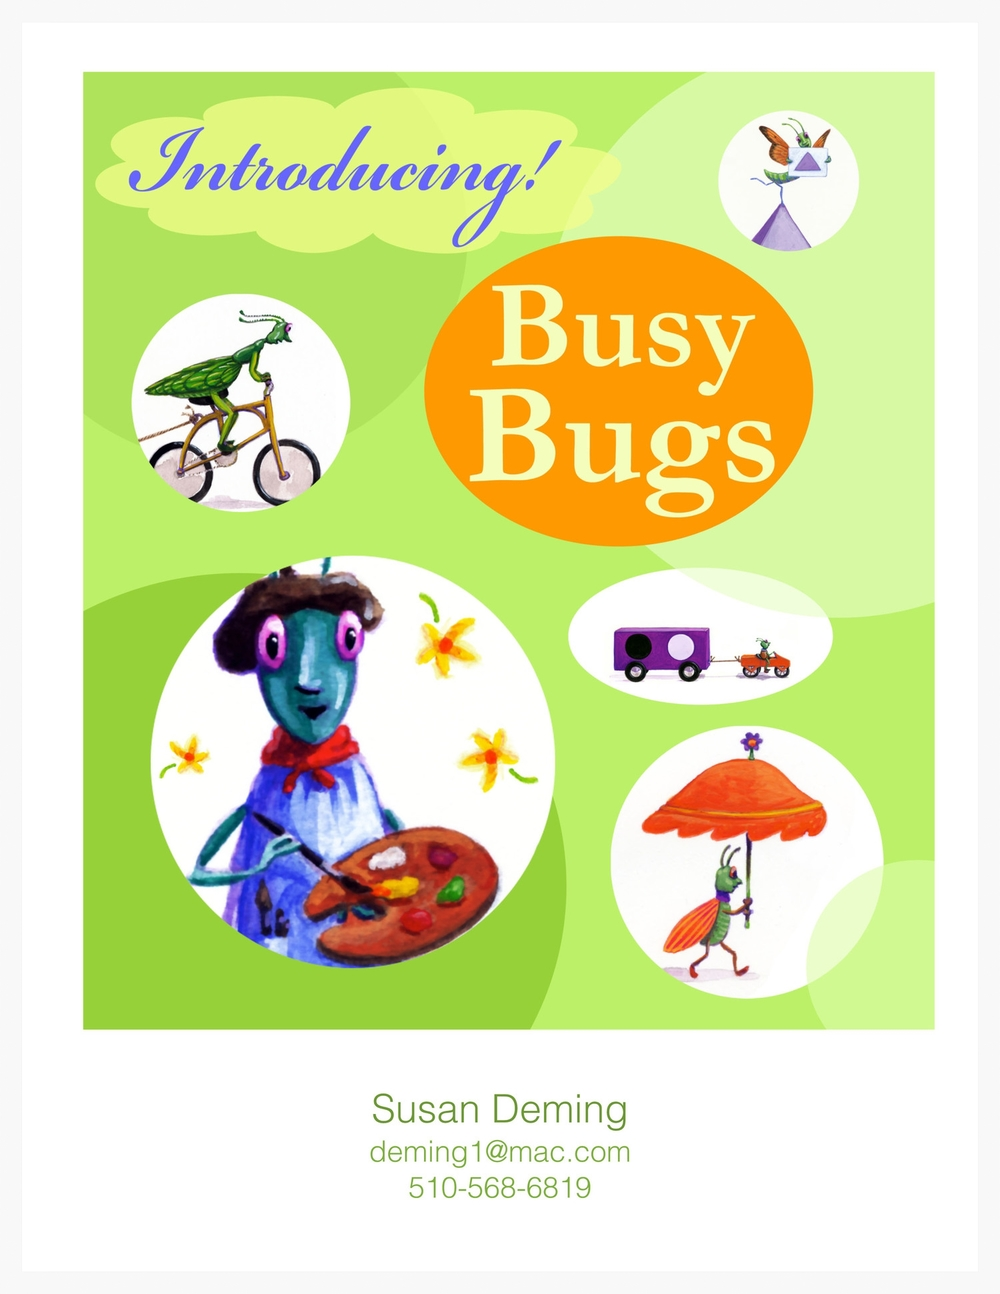 busy bugs promo 1.jpg